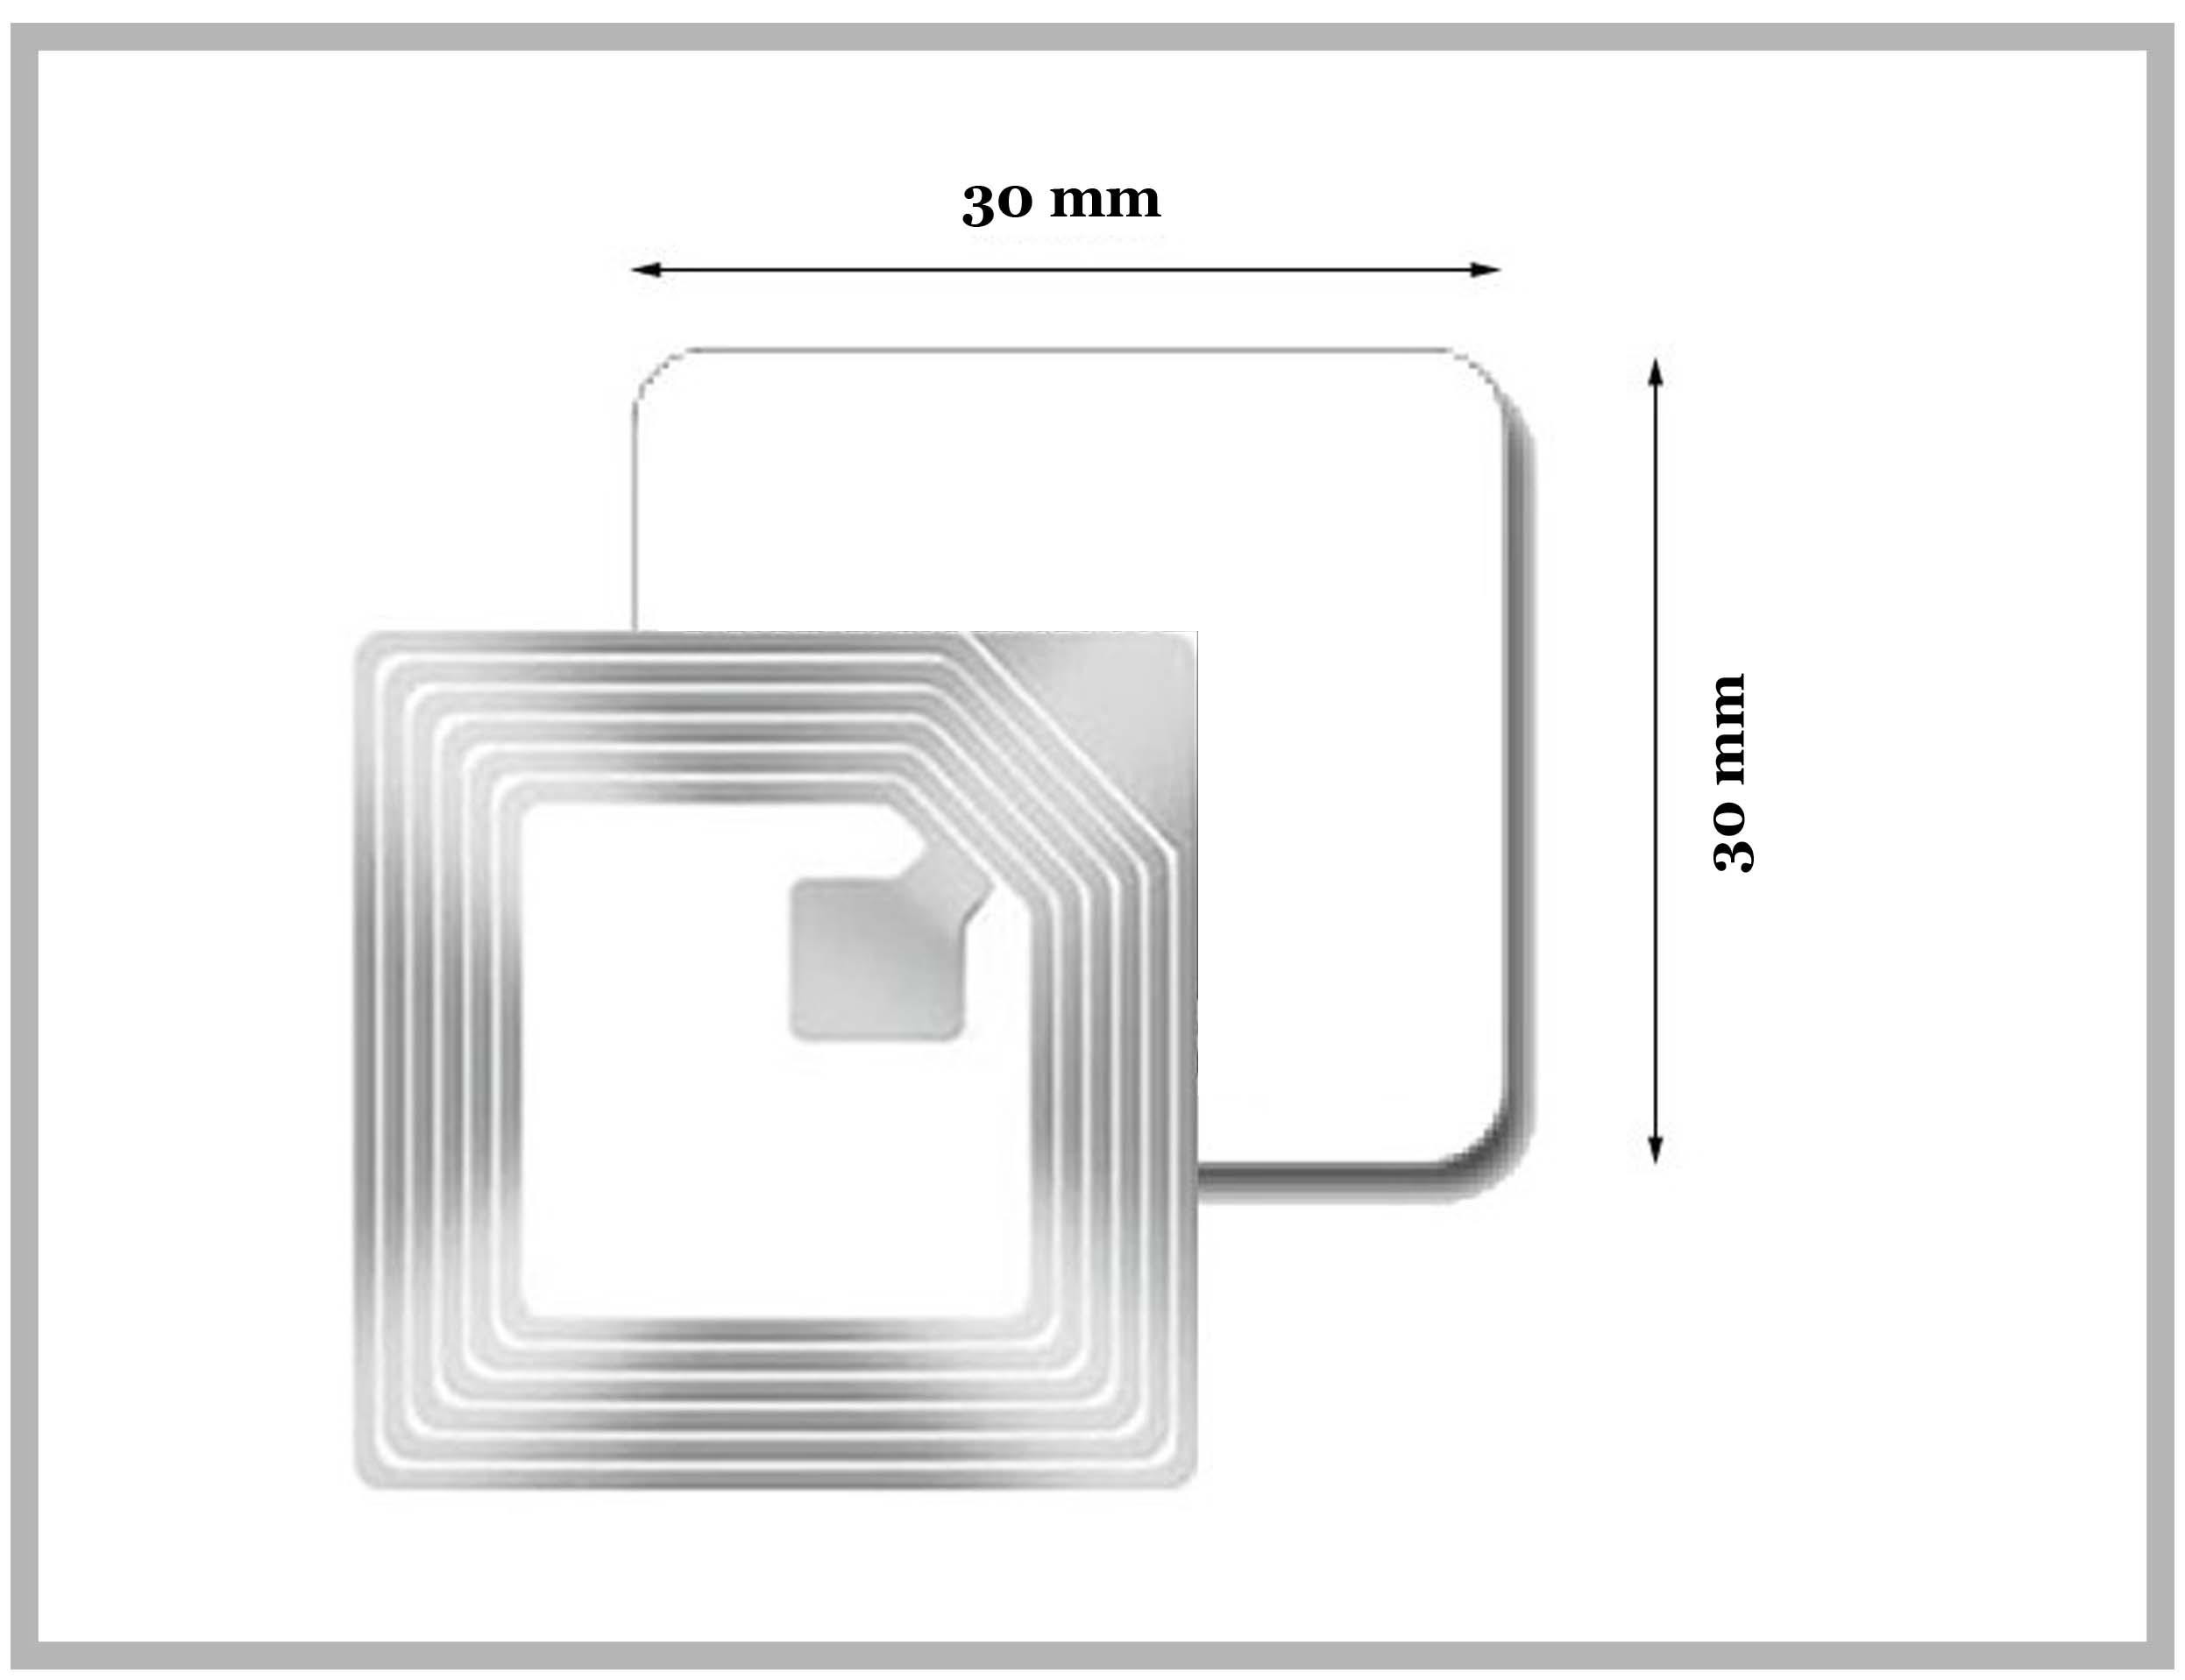 RF Label 30x30mm sans code barre